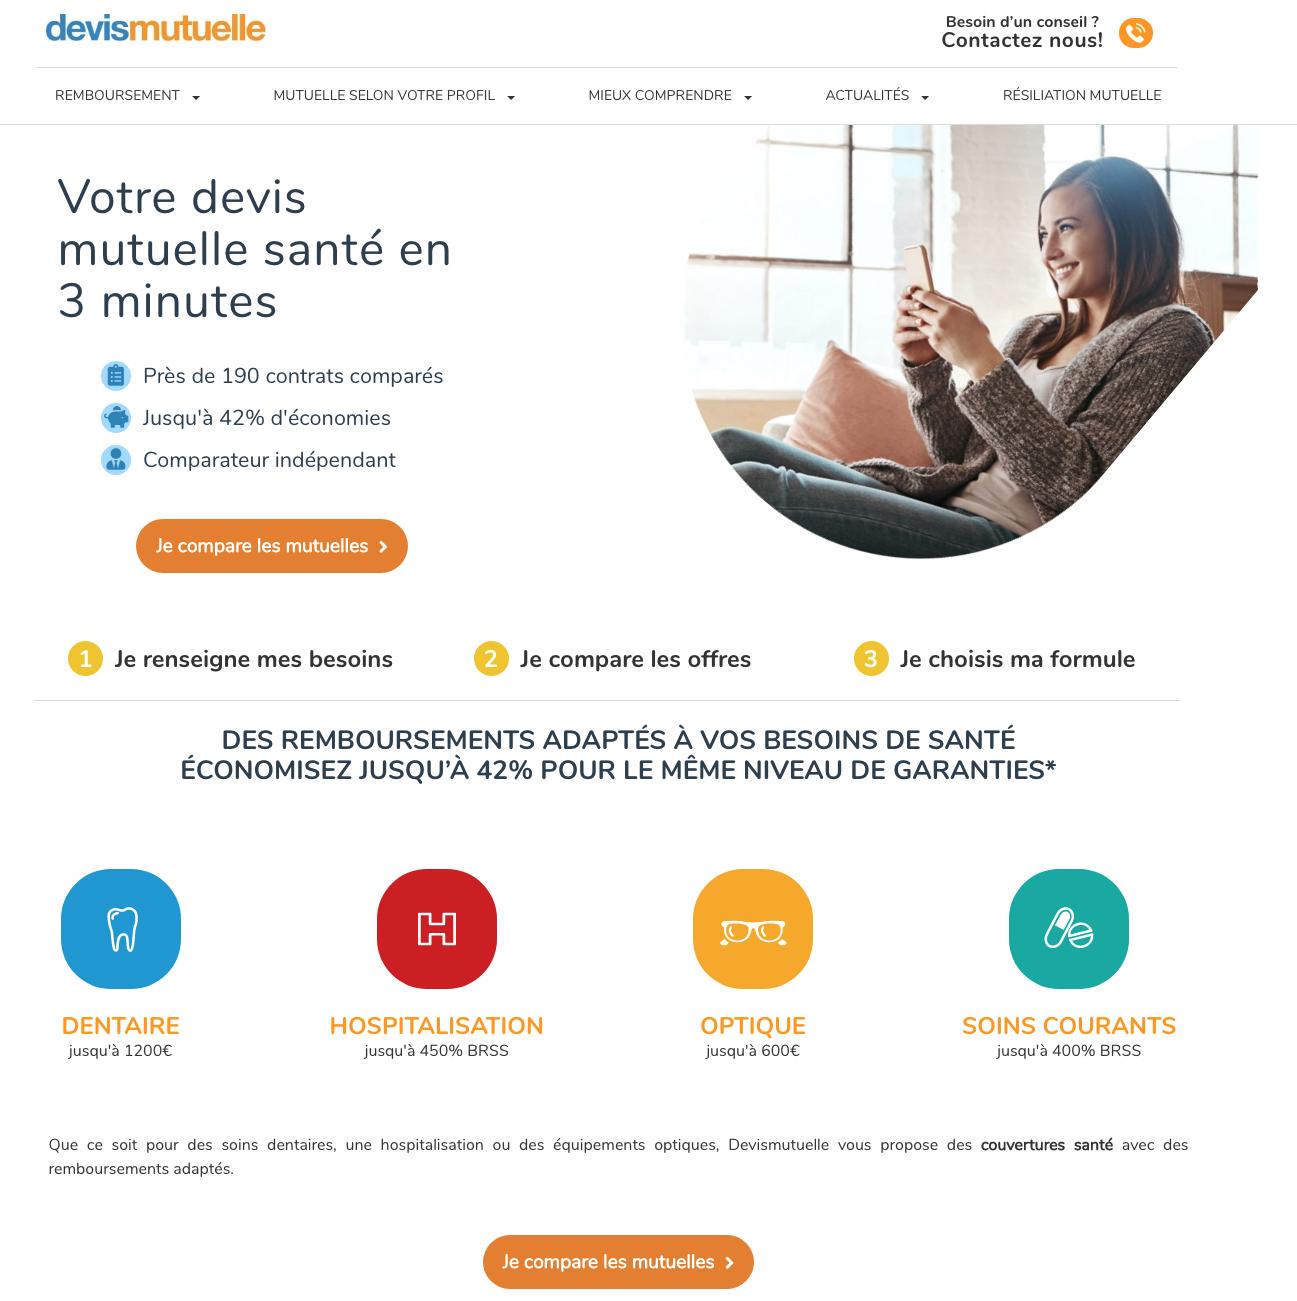 www.devismutuelle.com